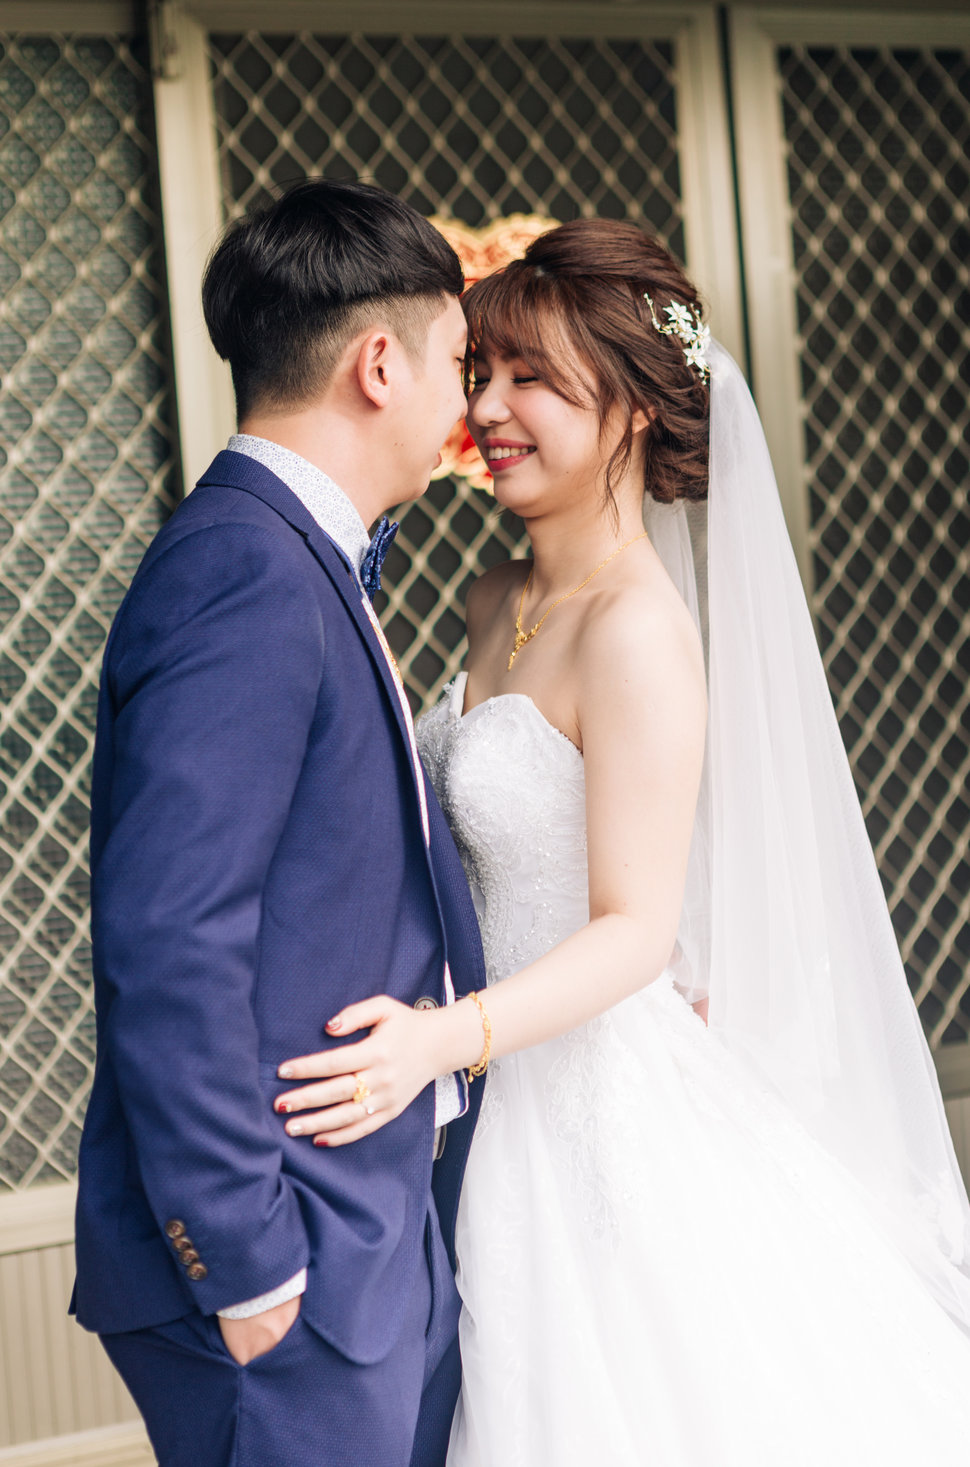 IMG_9065 - syuan影像紀錄 - 結婚吧